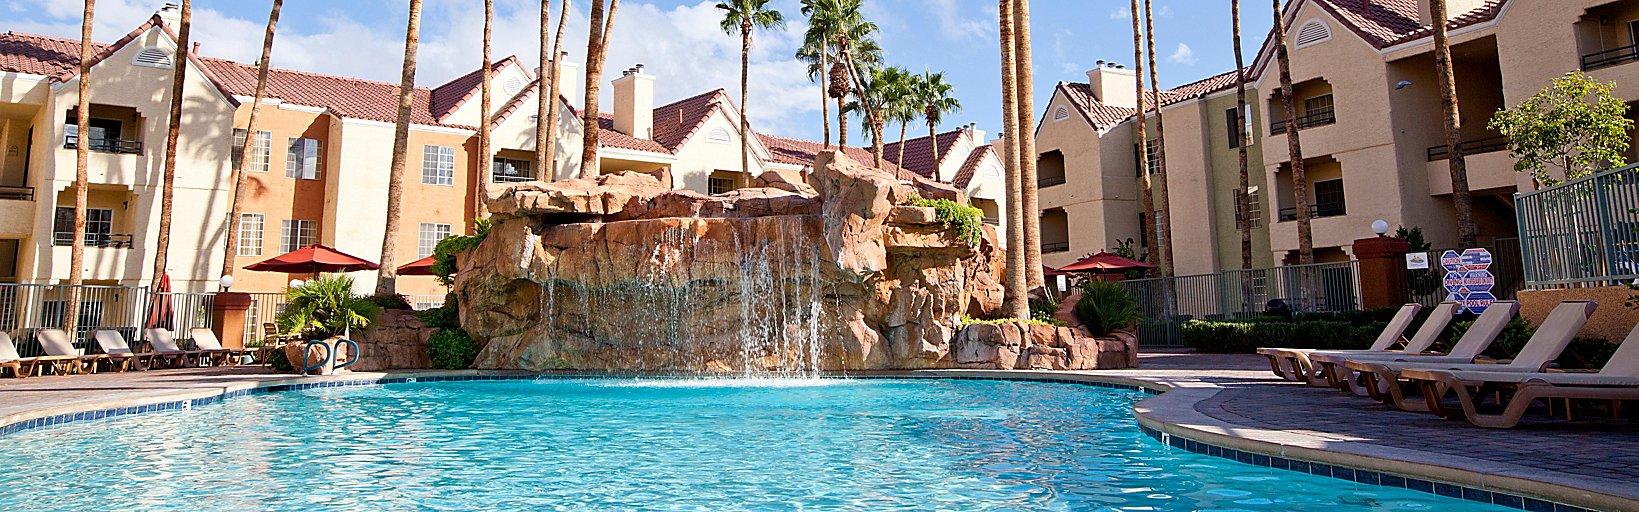 Las Vegas Resort Near Convention Center Holiday Inn Club